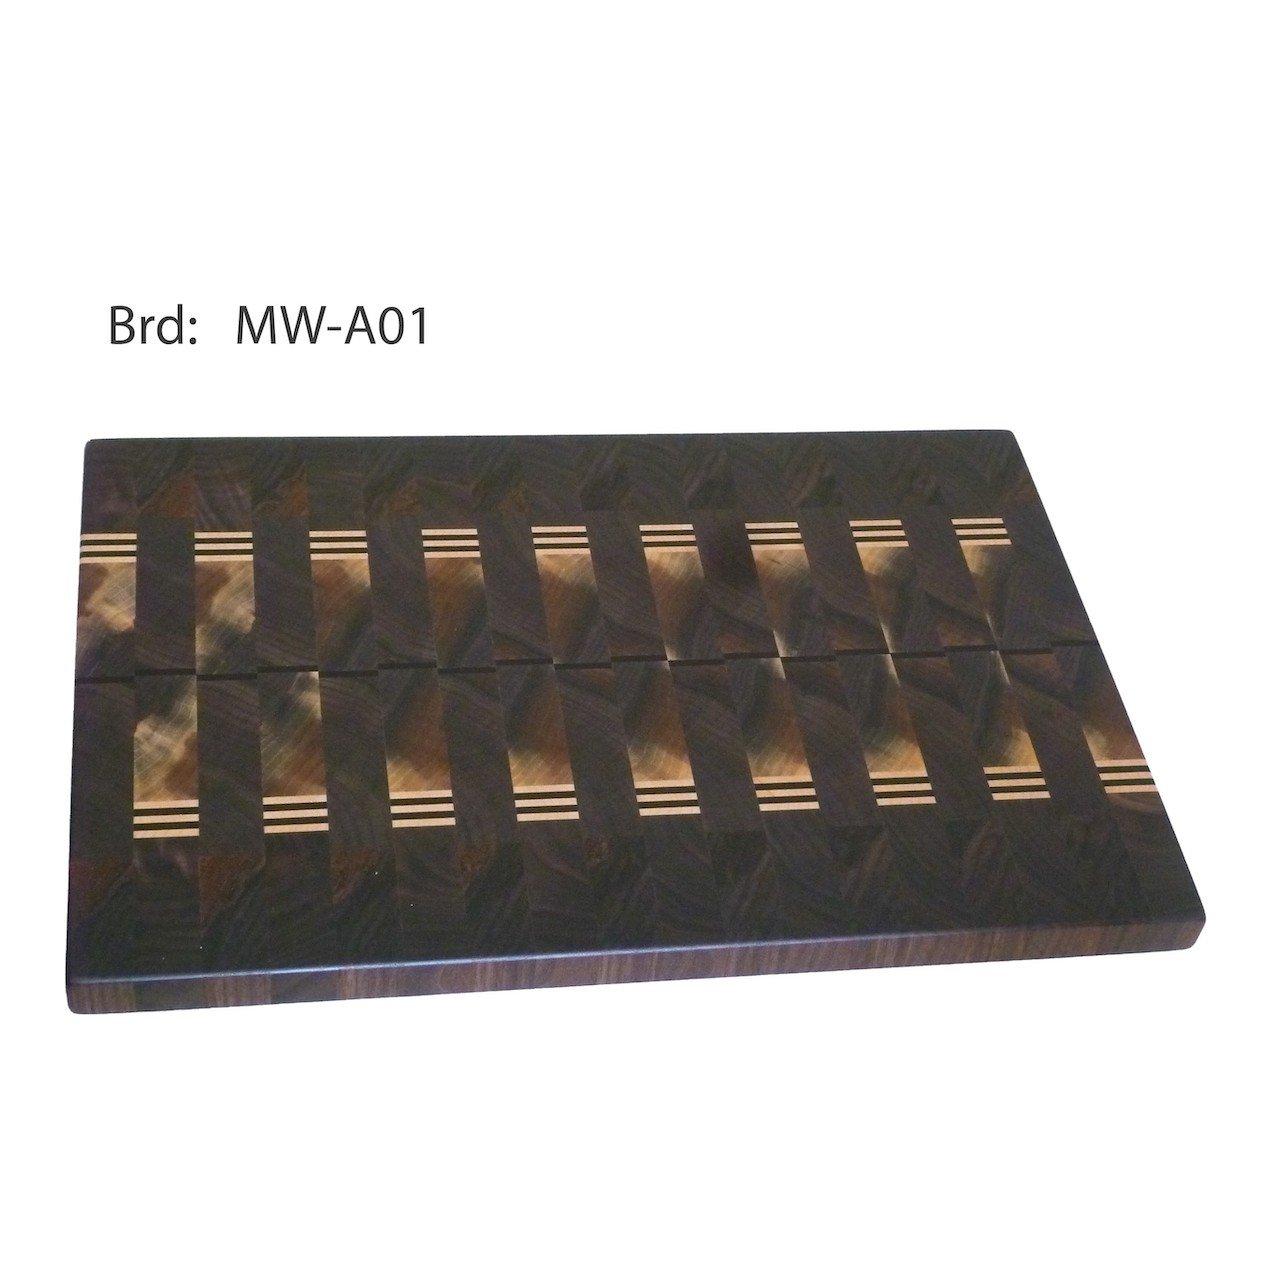 MW-A01